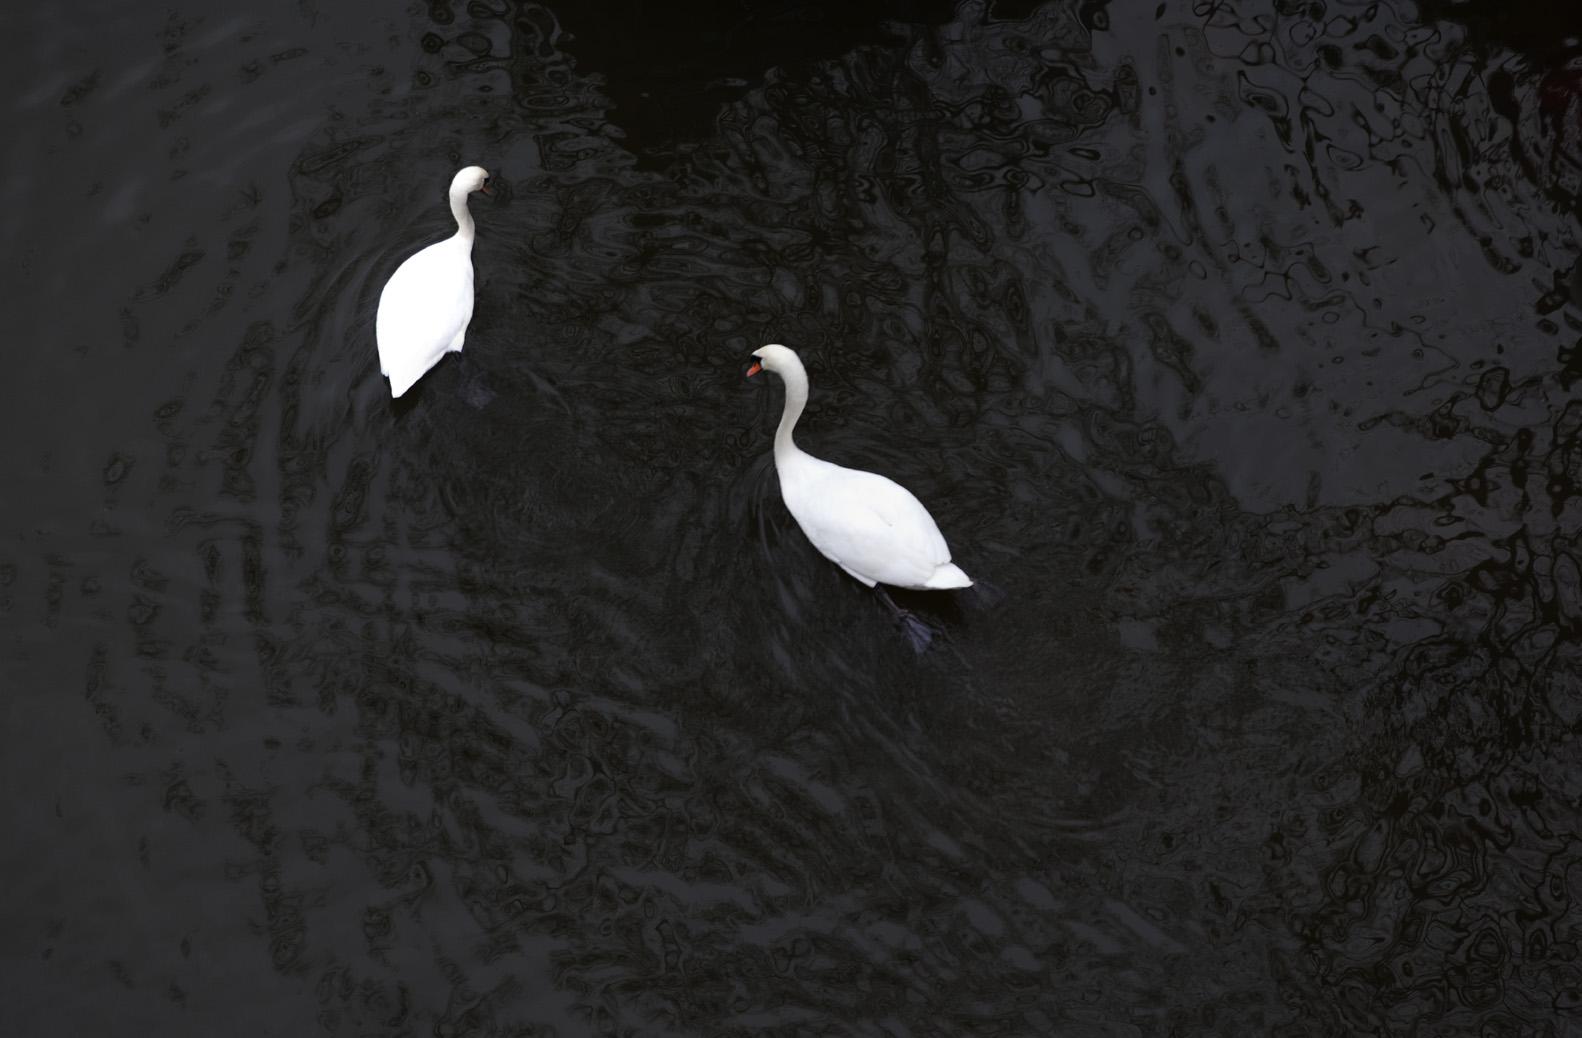 Swan_5297 copy.jpg